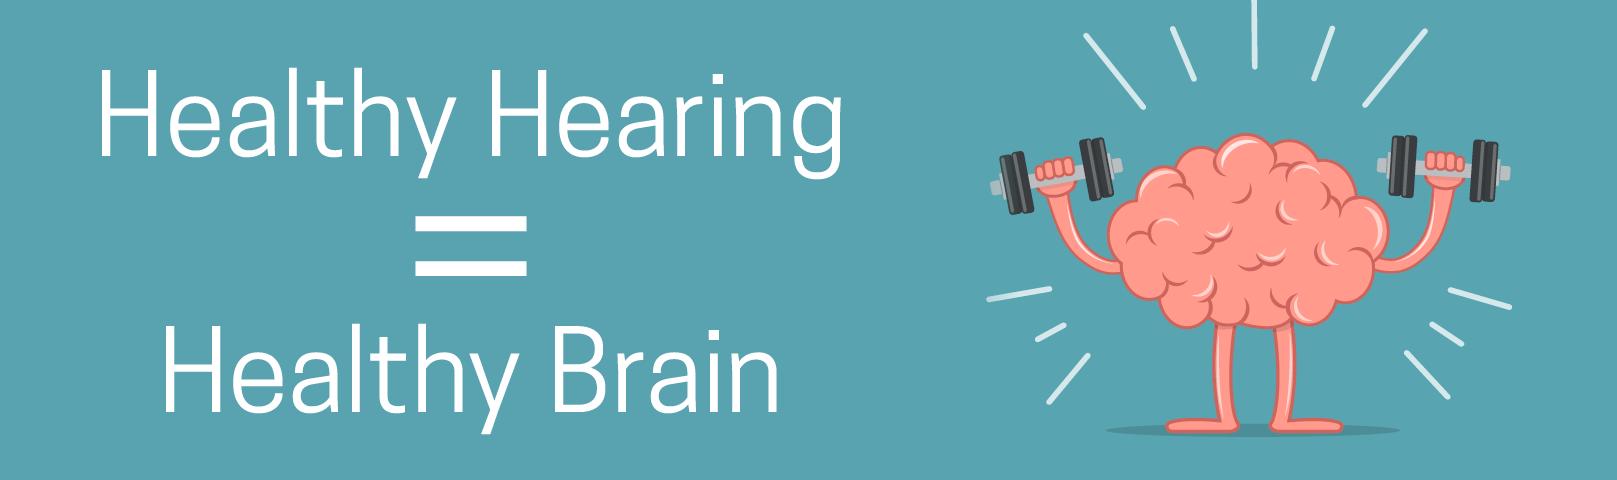 Healthy Hearing = Healthy Brain